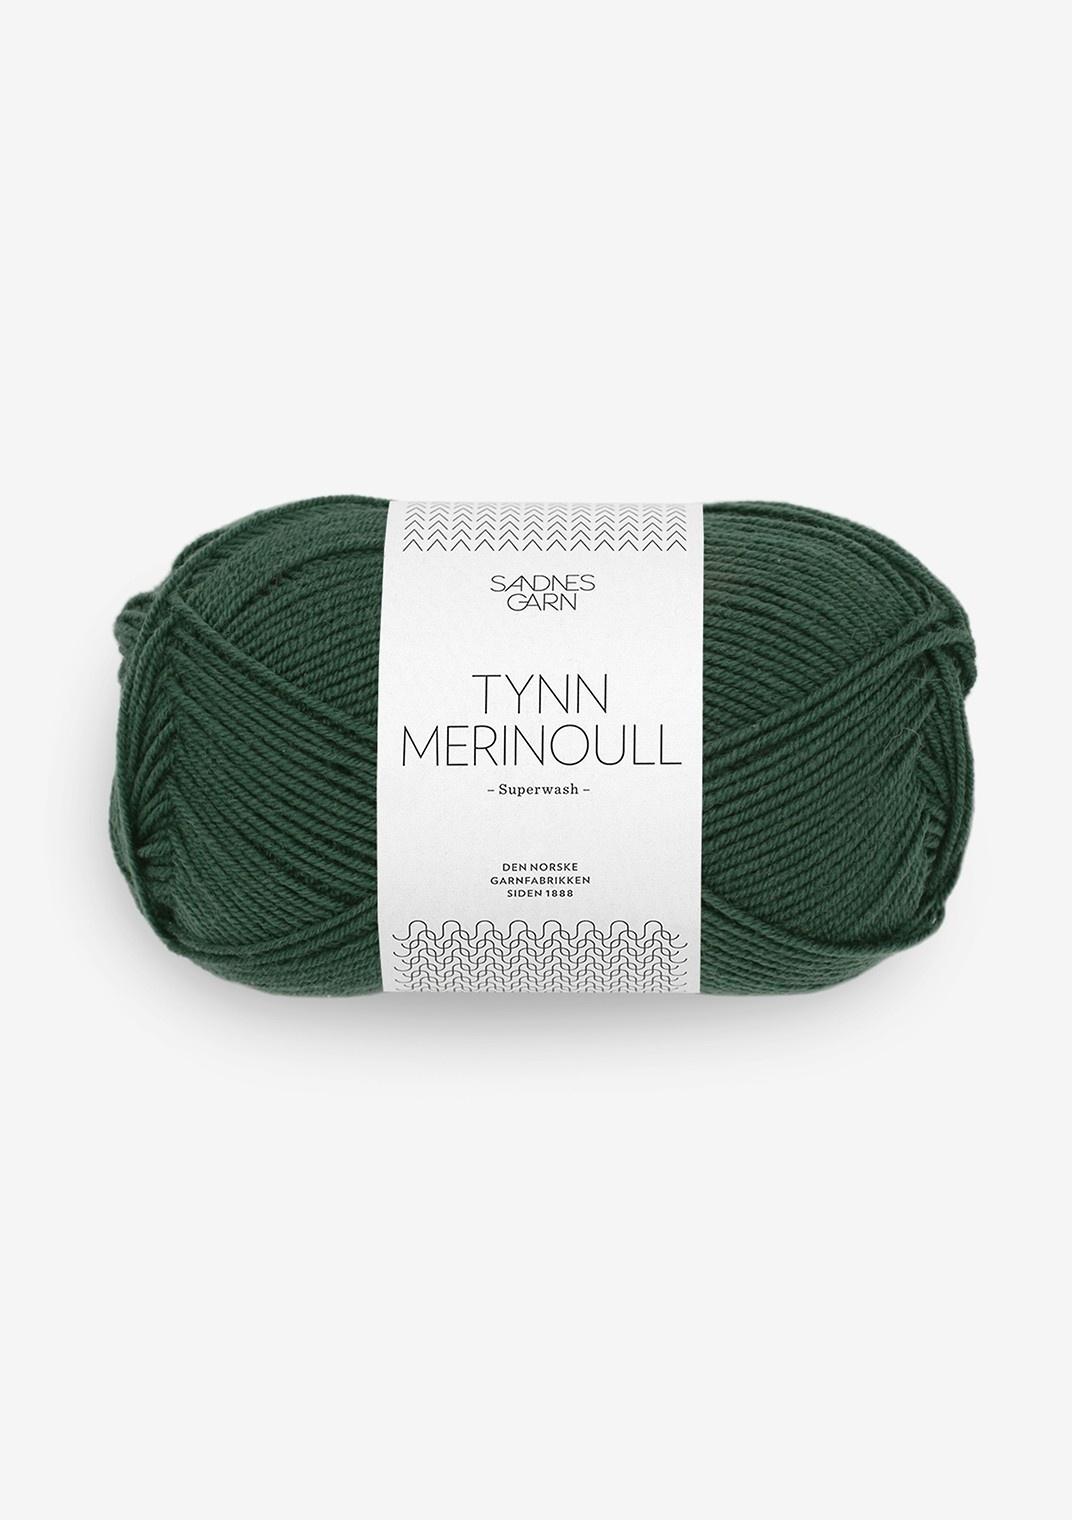 Sandnes Tynn Merino Ull - Nr. 8581 - Dyp skoggrønn